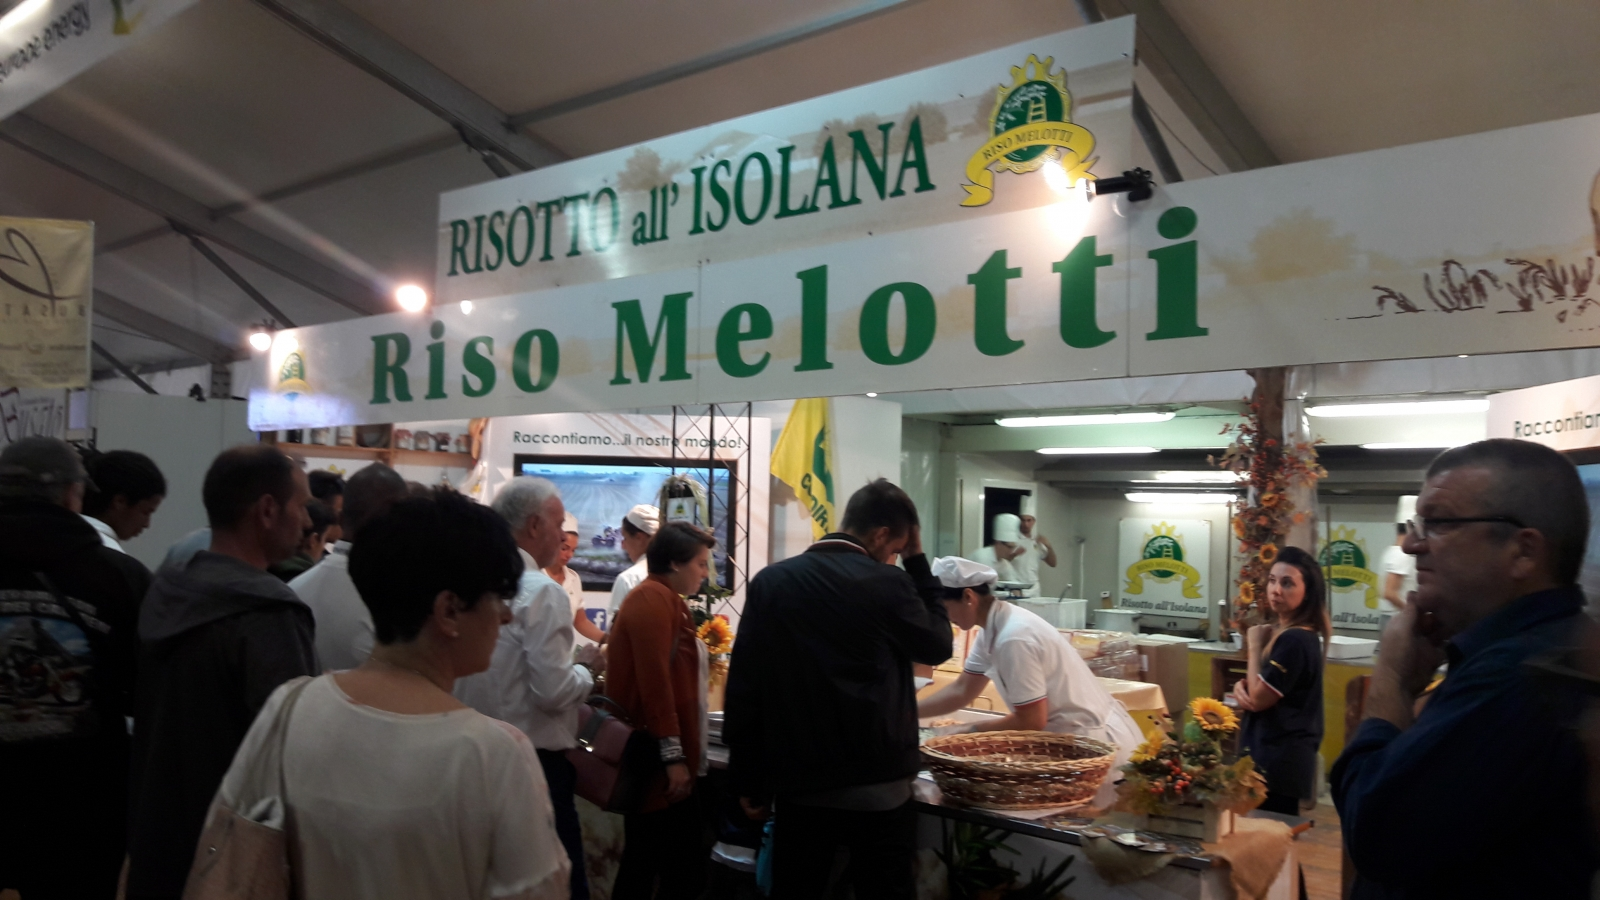 Reisfest in Isola (4)